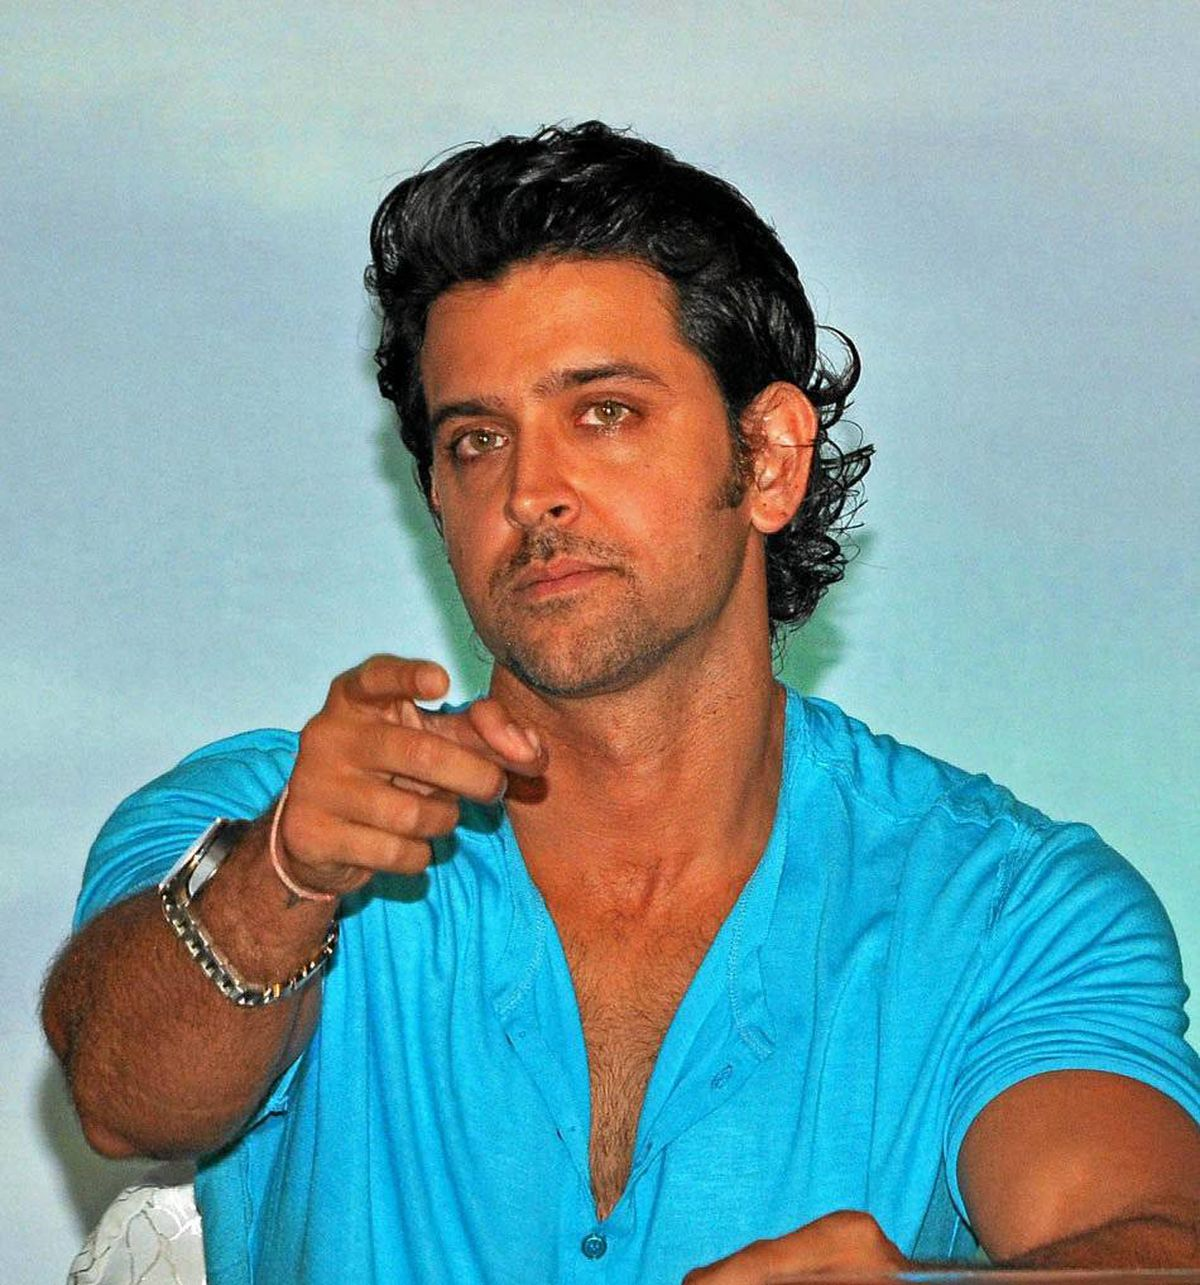 Hritik Roshan stars in the Hindi film 'Zindagi Na Milegi Dobara,' directed by Zoya Akhtar.